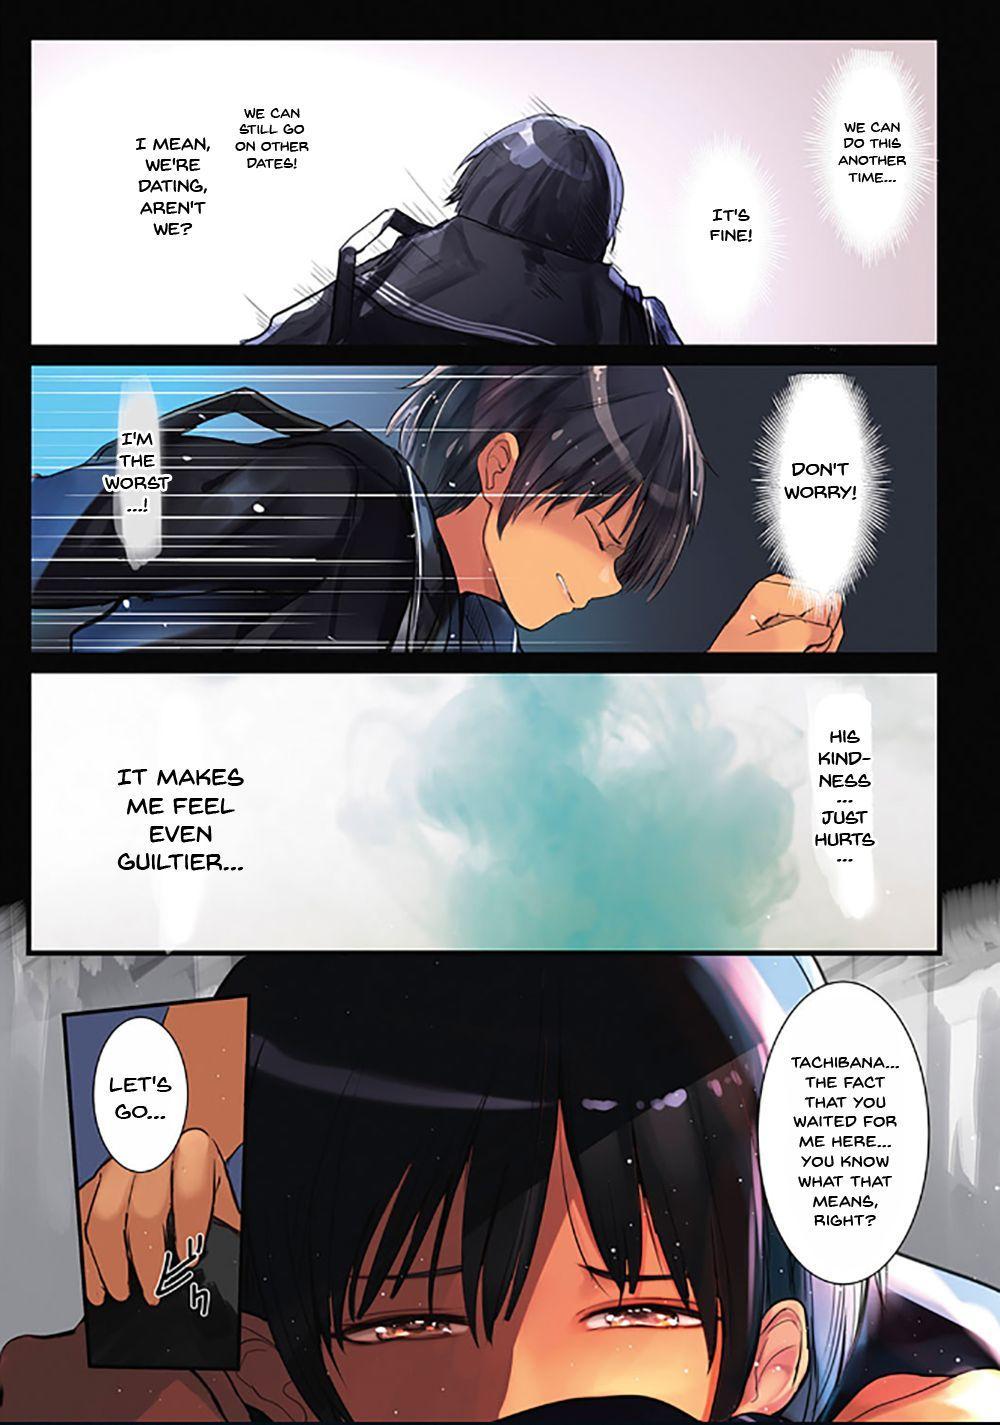 Karada Ubaware Kokoro Yurare | Stolen Body Changing Heart Ch.1-2 51